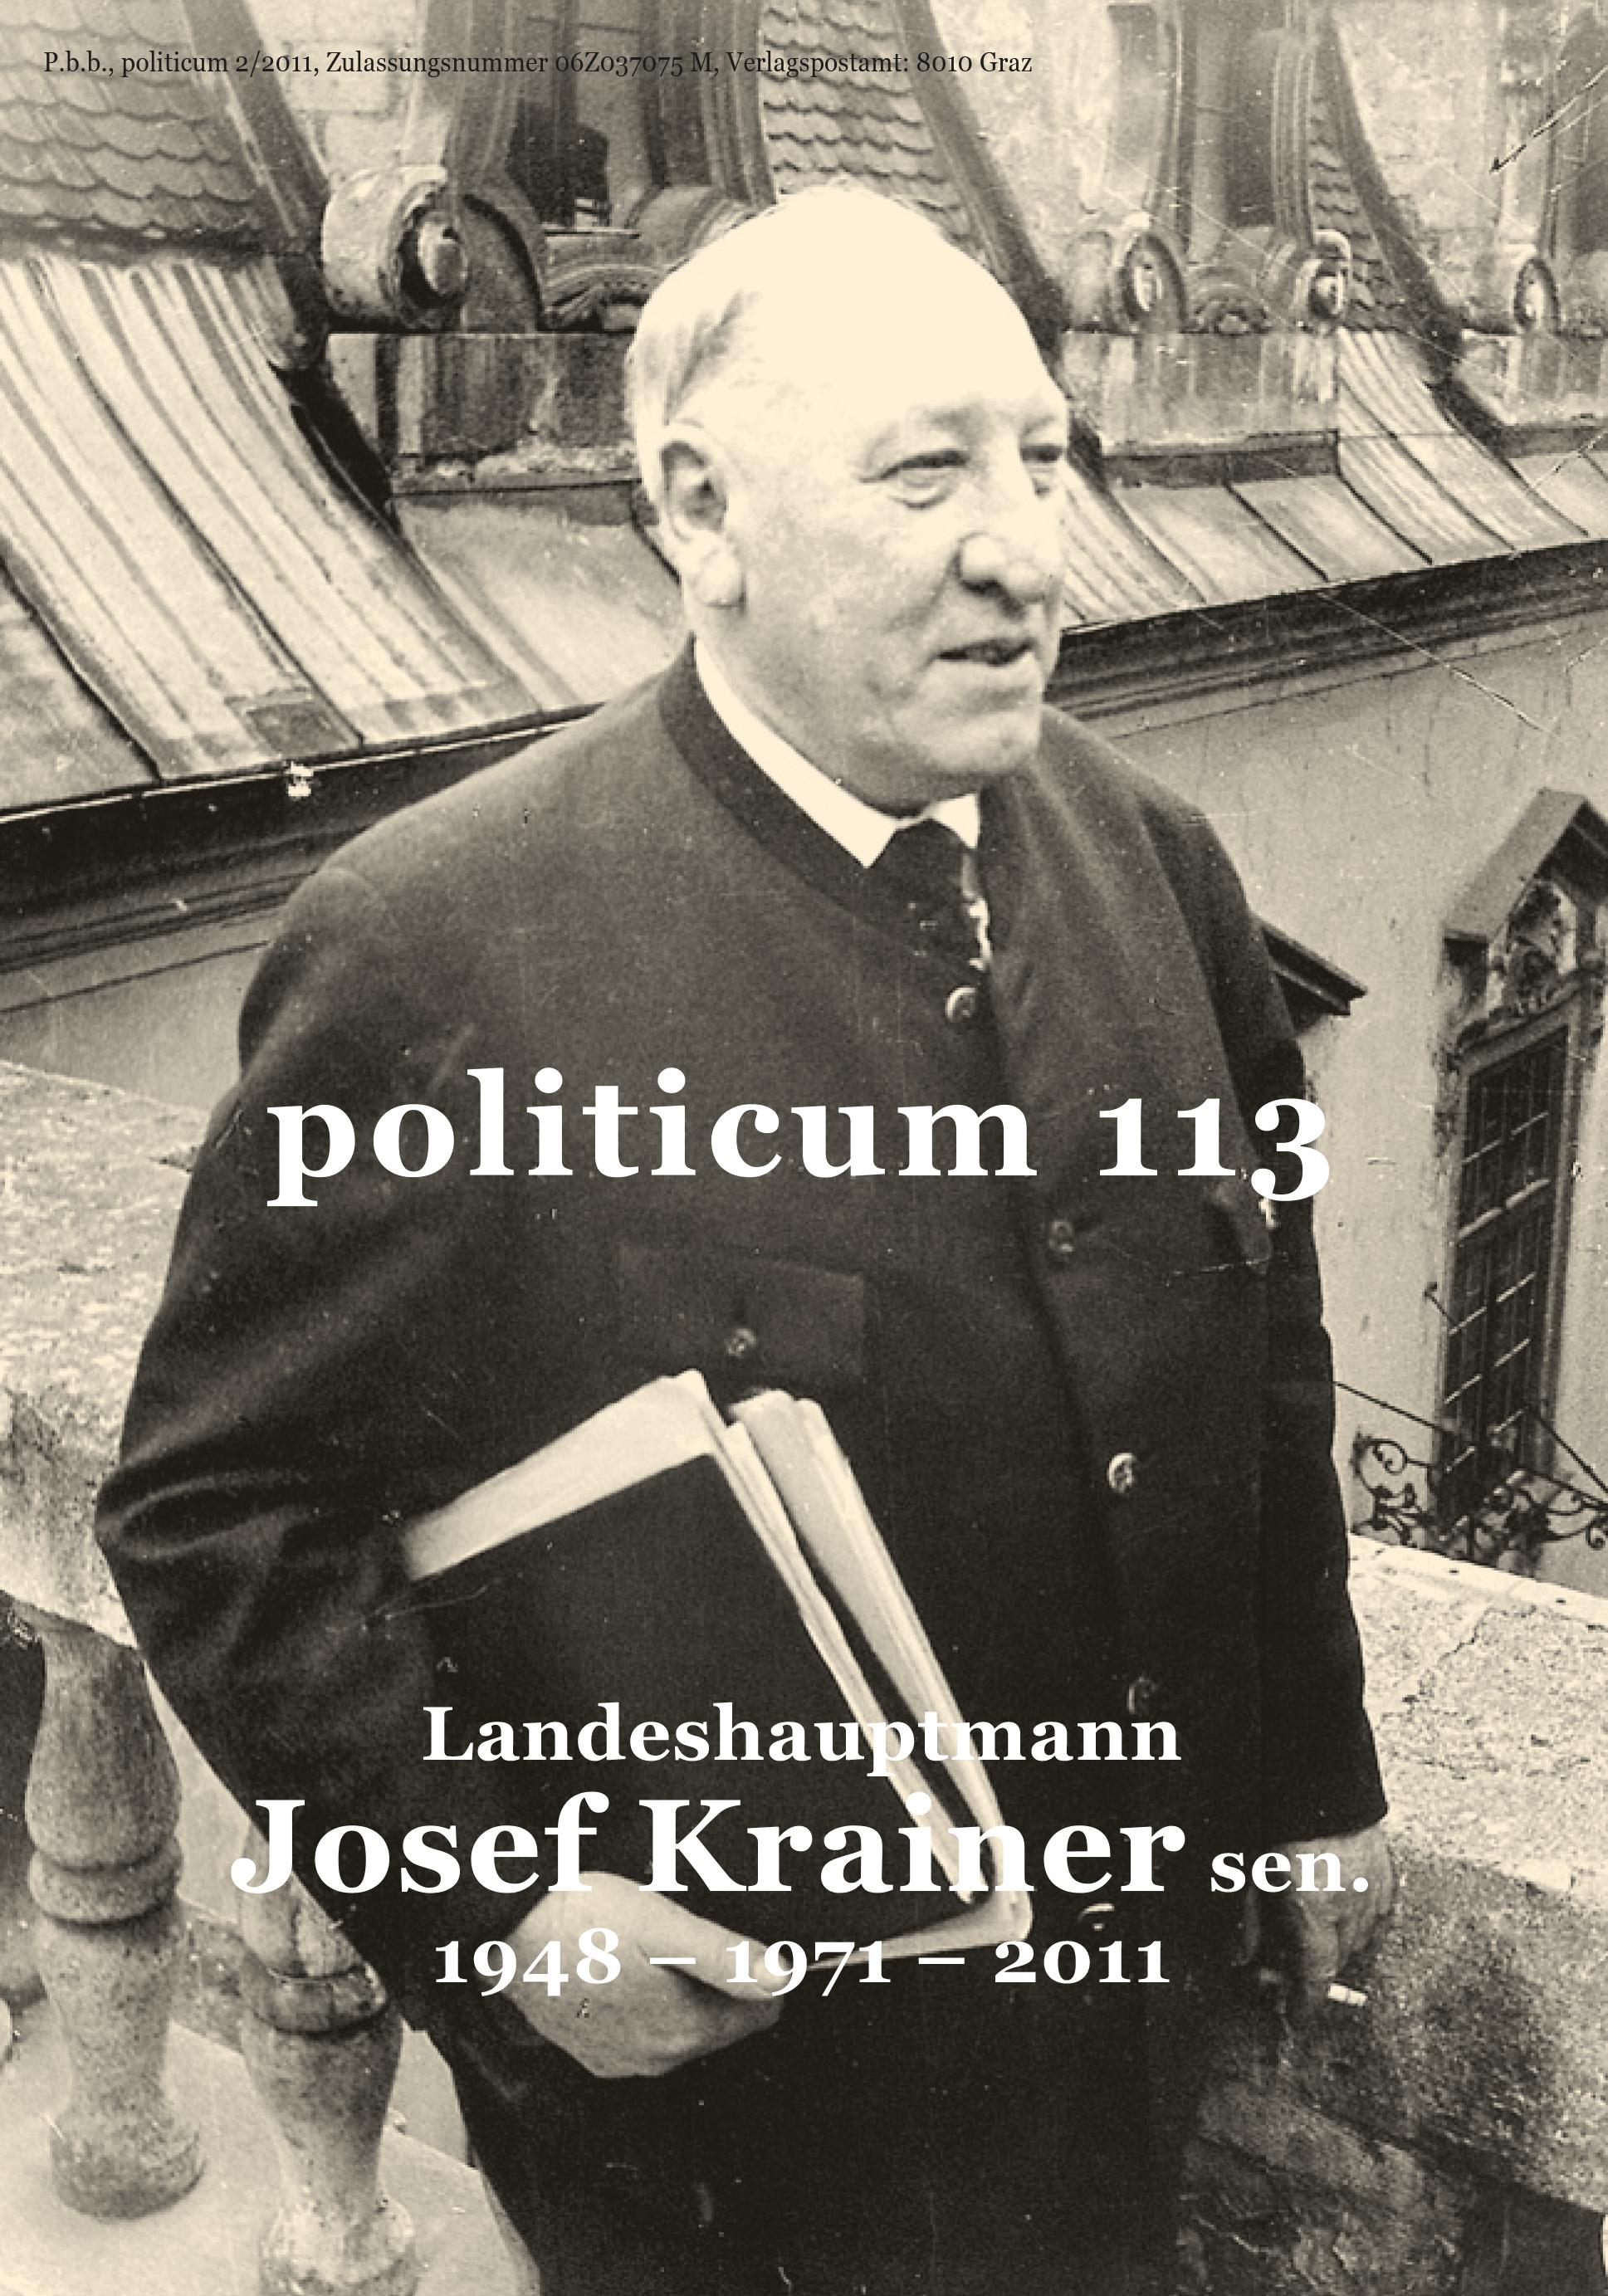 stvp11_politicum-113_cov.indd